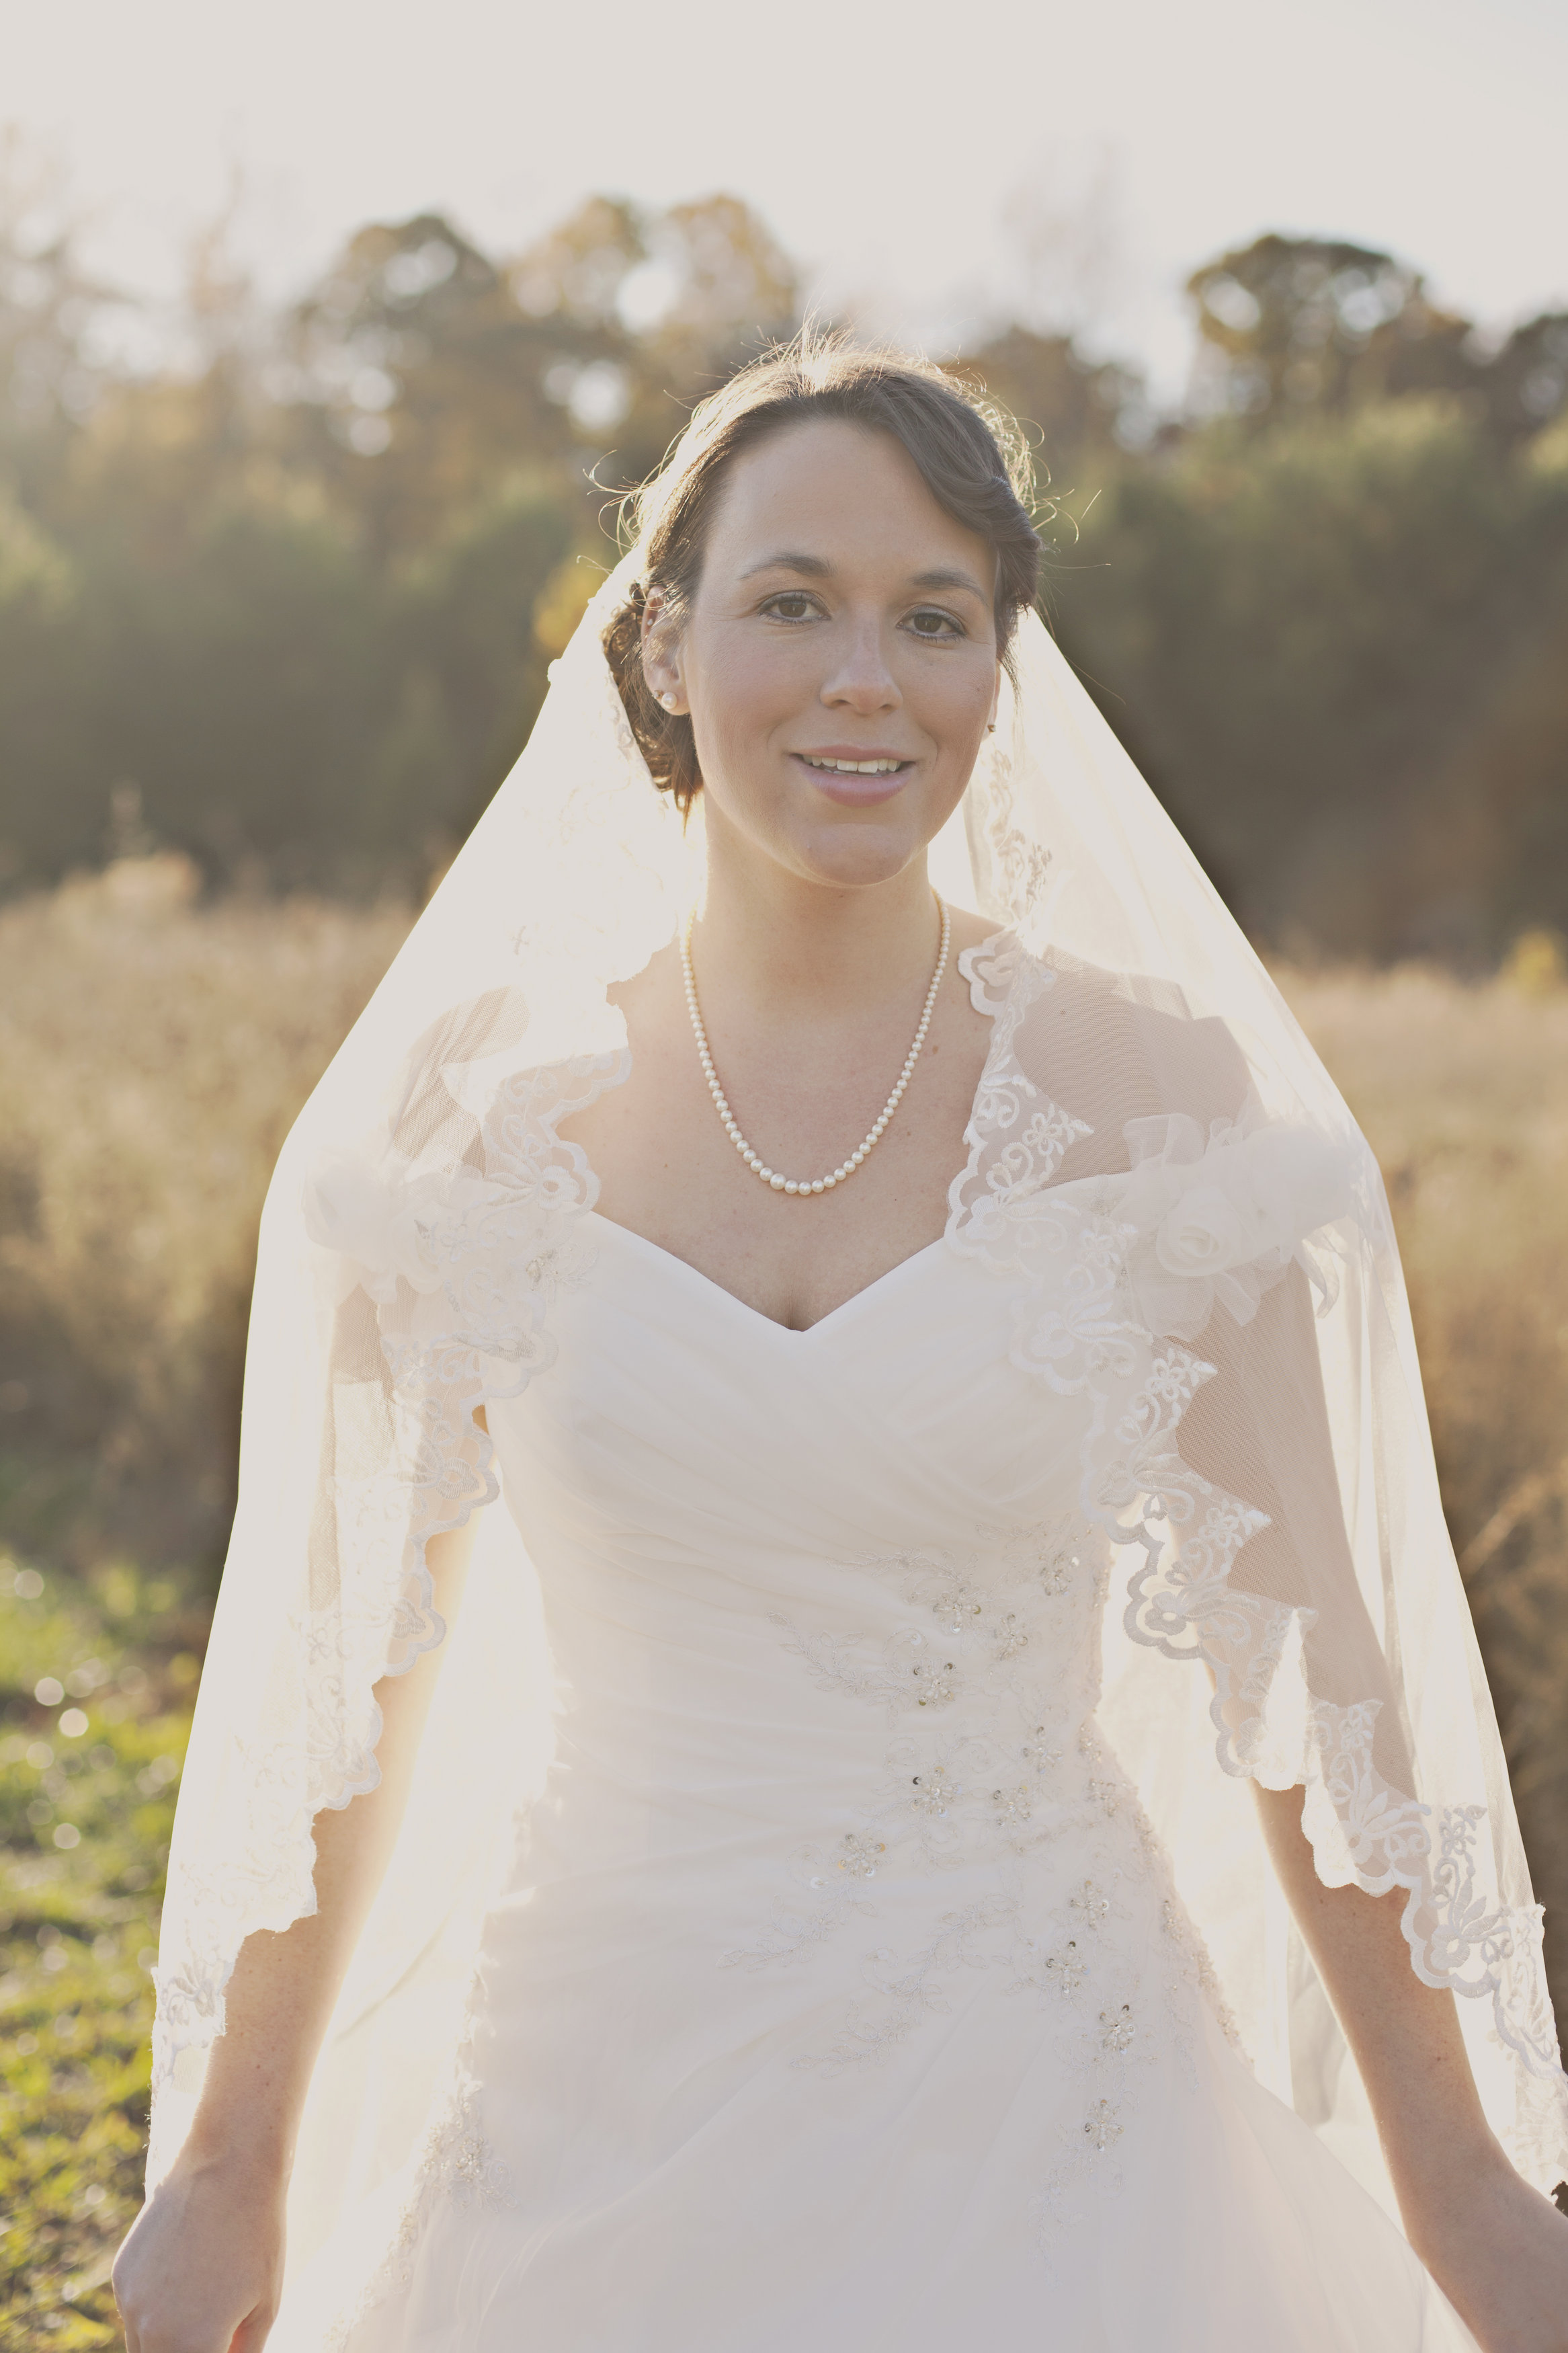 Katharine bridals-Katharine bridals edited-0053.jpg